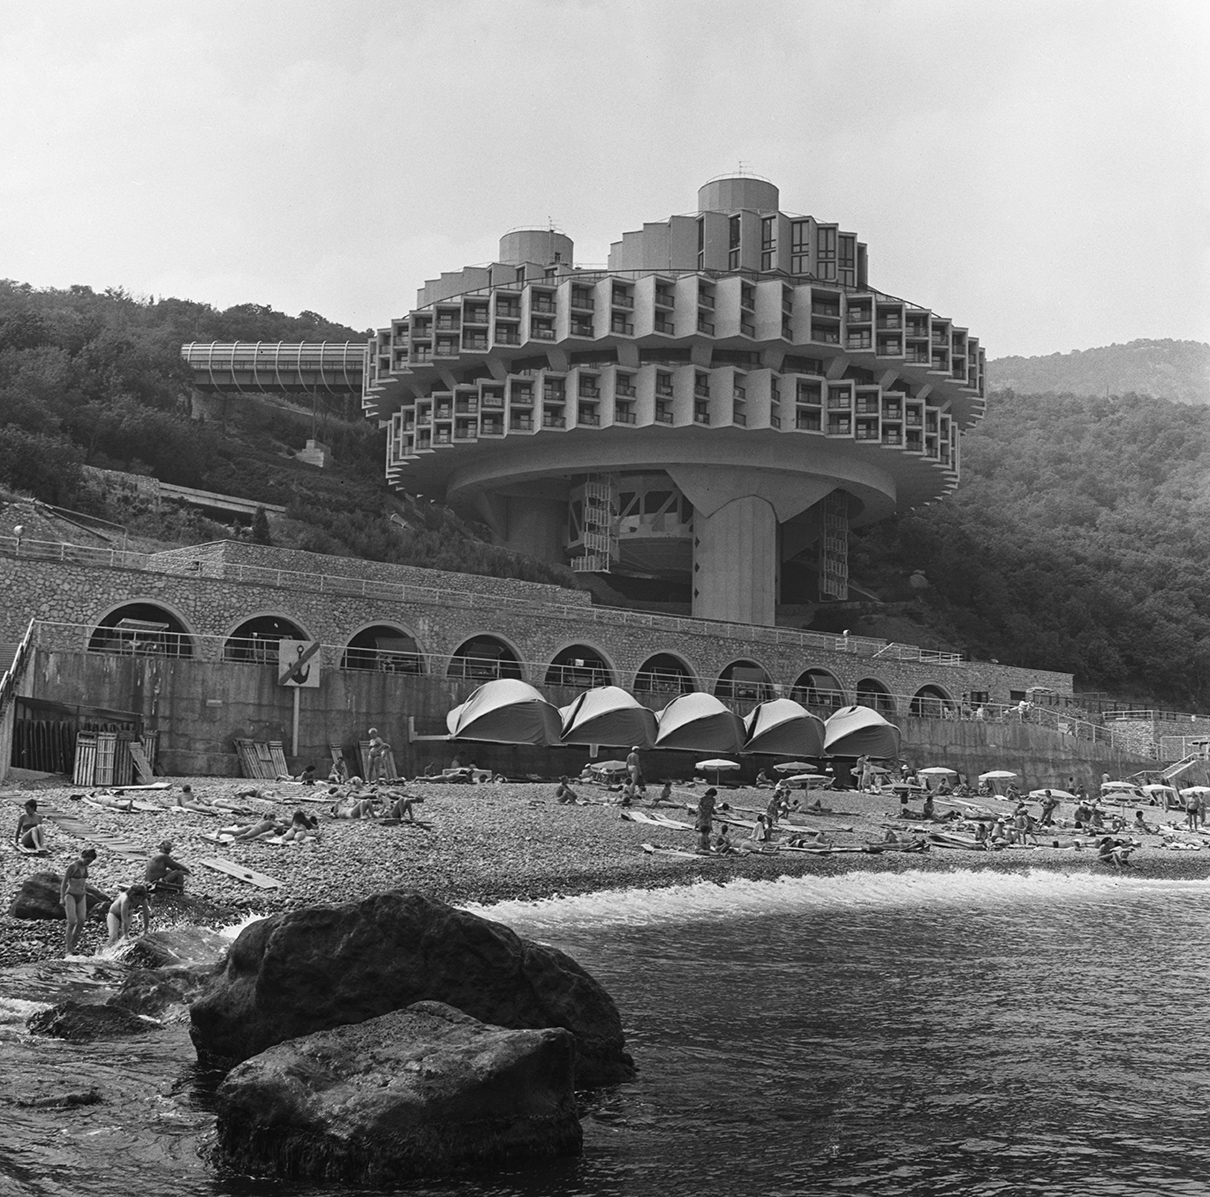 Вид чехословацко-советского пансионата «Дружба» в Ялте